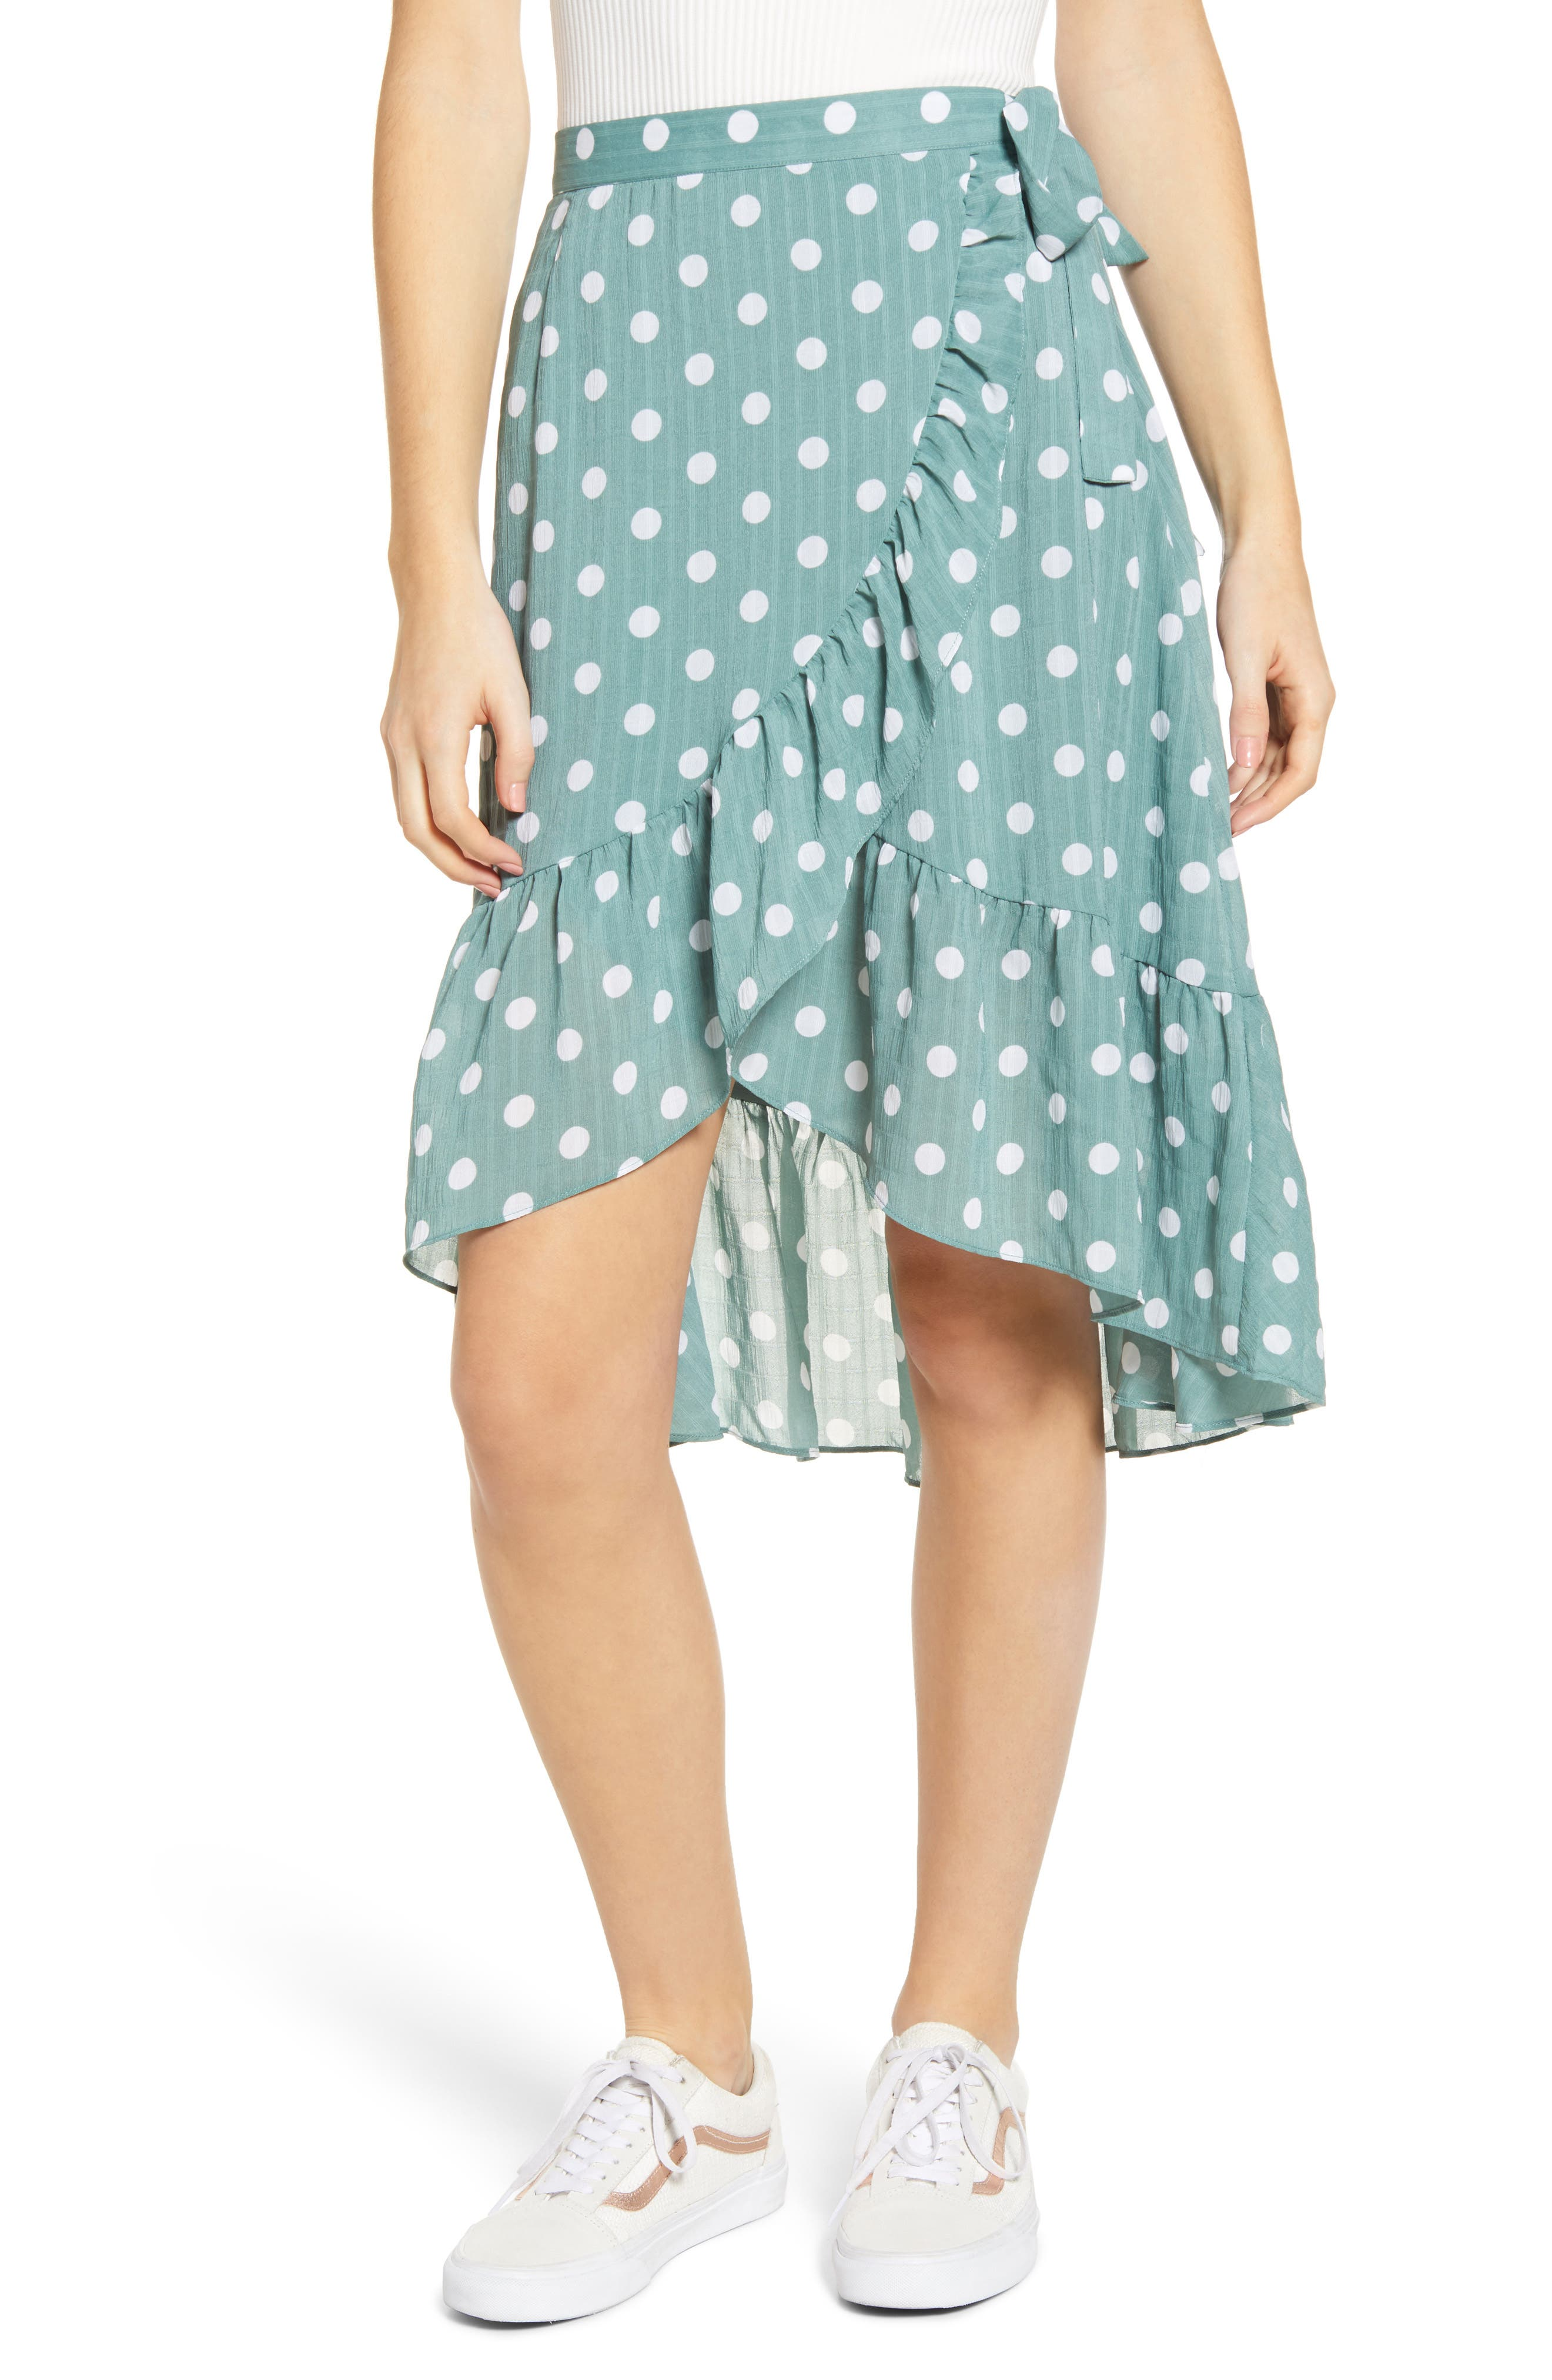 Minkpink Misty Polka Dot Ruffle Wrap Skirt, Green